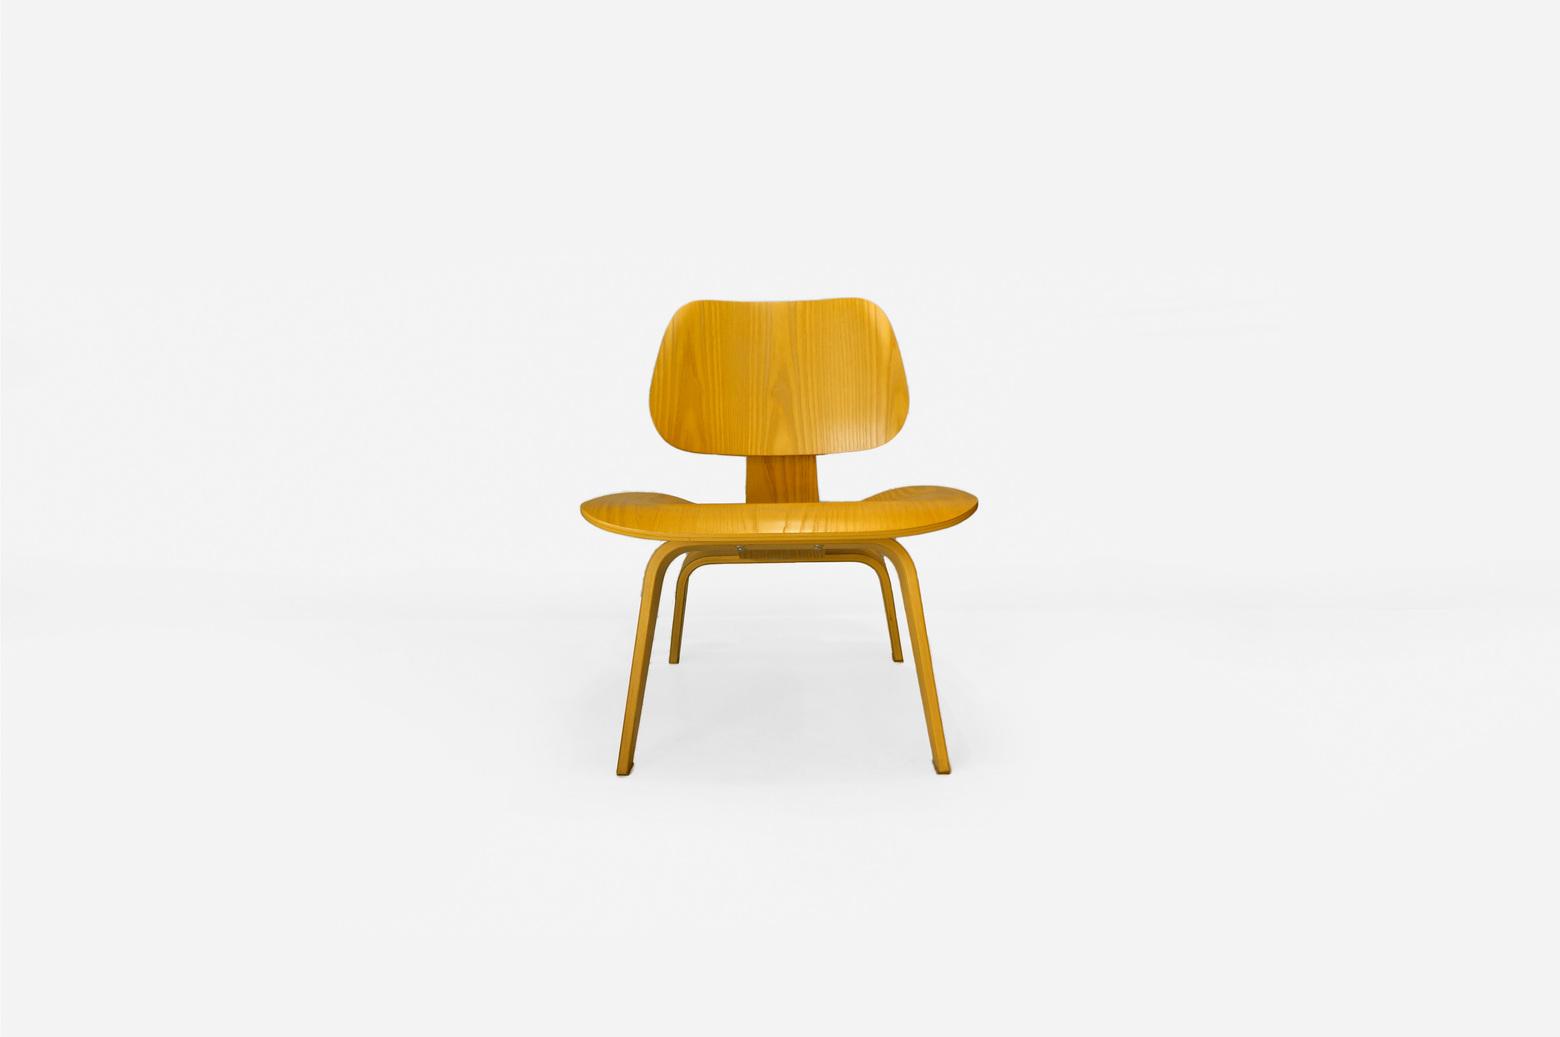 Herman Miller EAMES Plywood Chair LCW Light Ash/ハーマンミラー イームズ プライウッドチェア ライトアッシュ